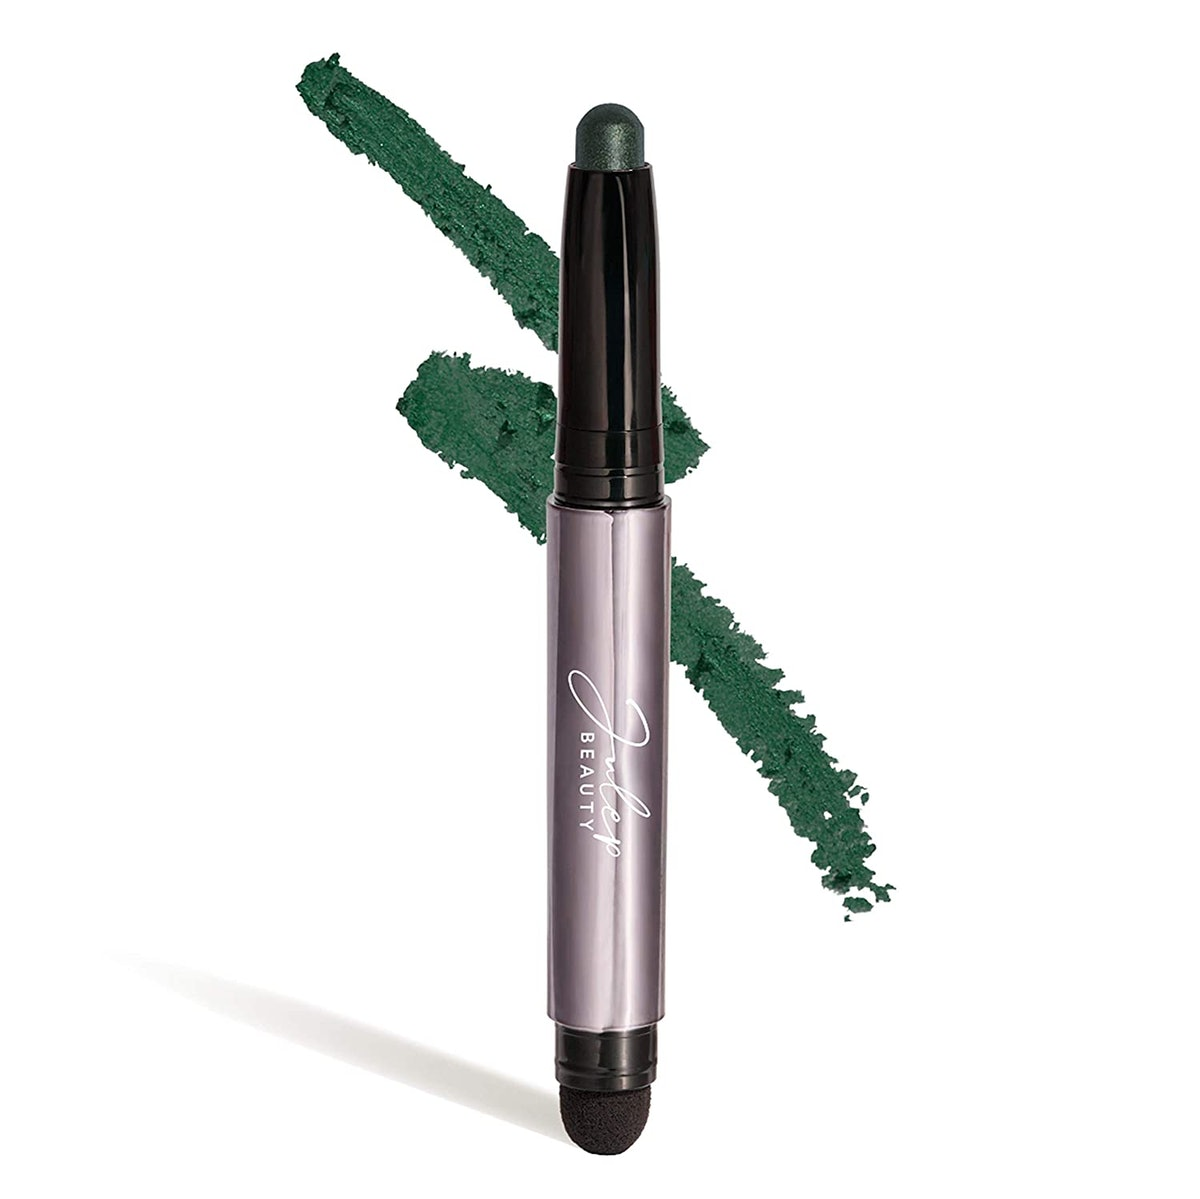 Julep Eyeshadow 101 Crème to Powder Waterproof Eyeshadow Stick